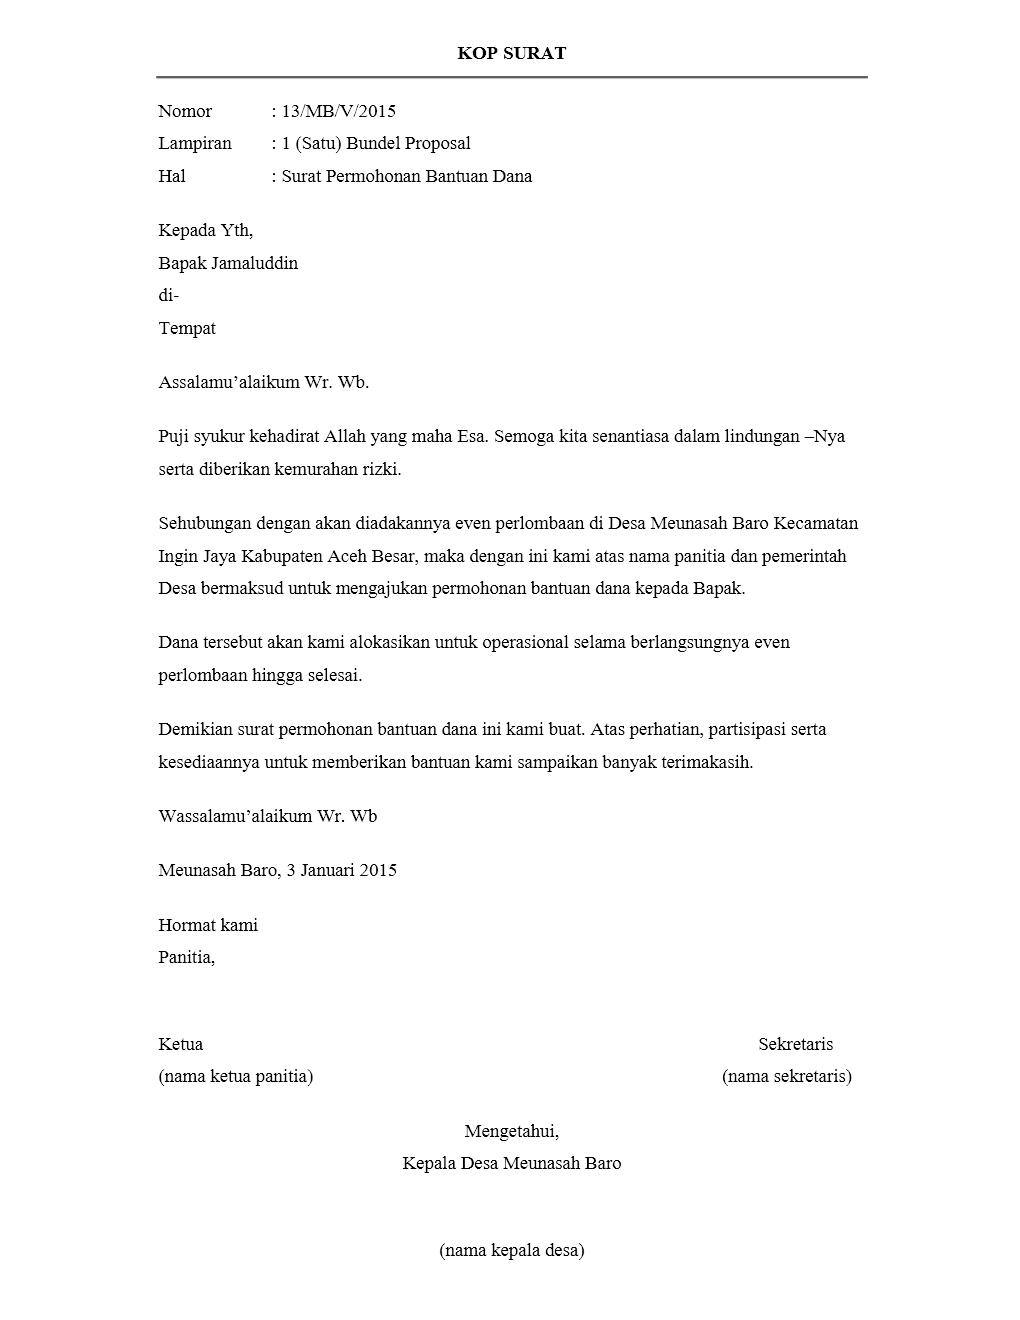 Contoh Surat Pengantar Proposal Yang Resmi Dan Benar Kumpulan Contoh Surat